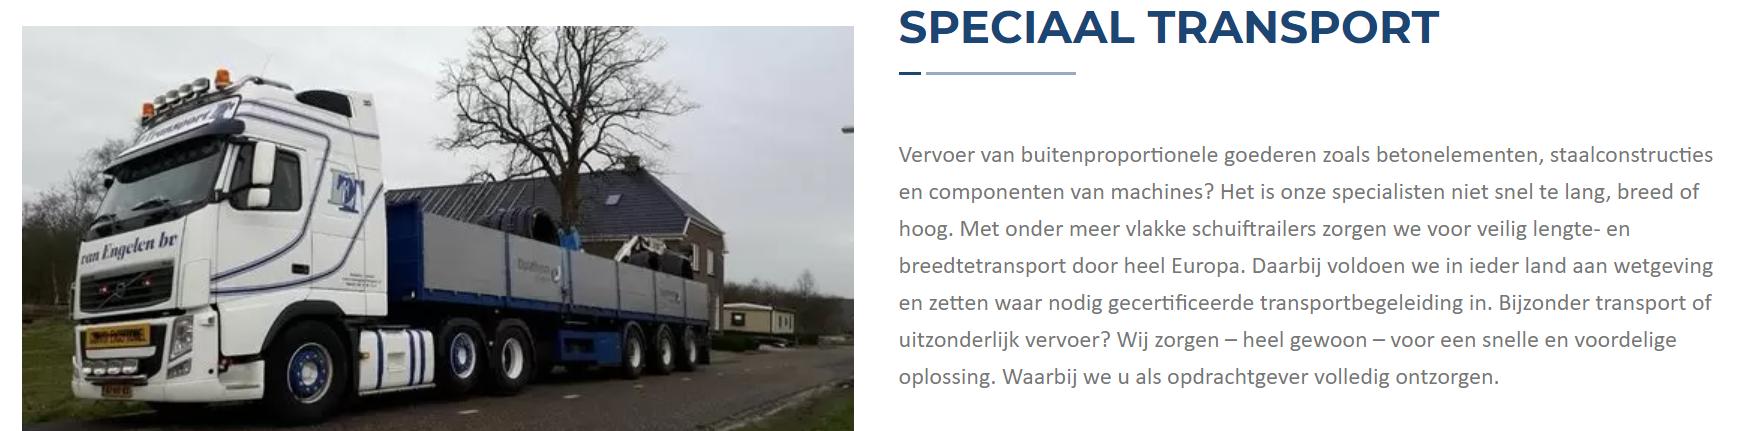 Speciaal-Transport-